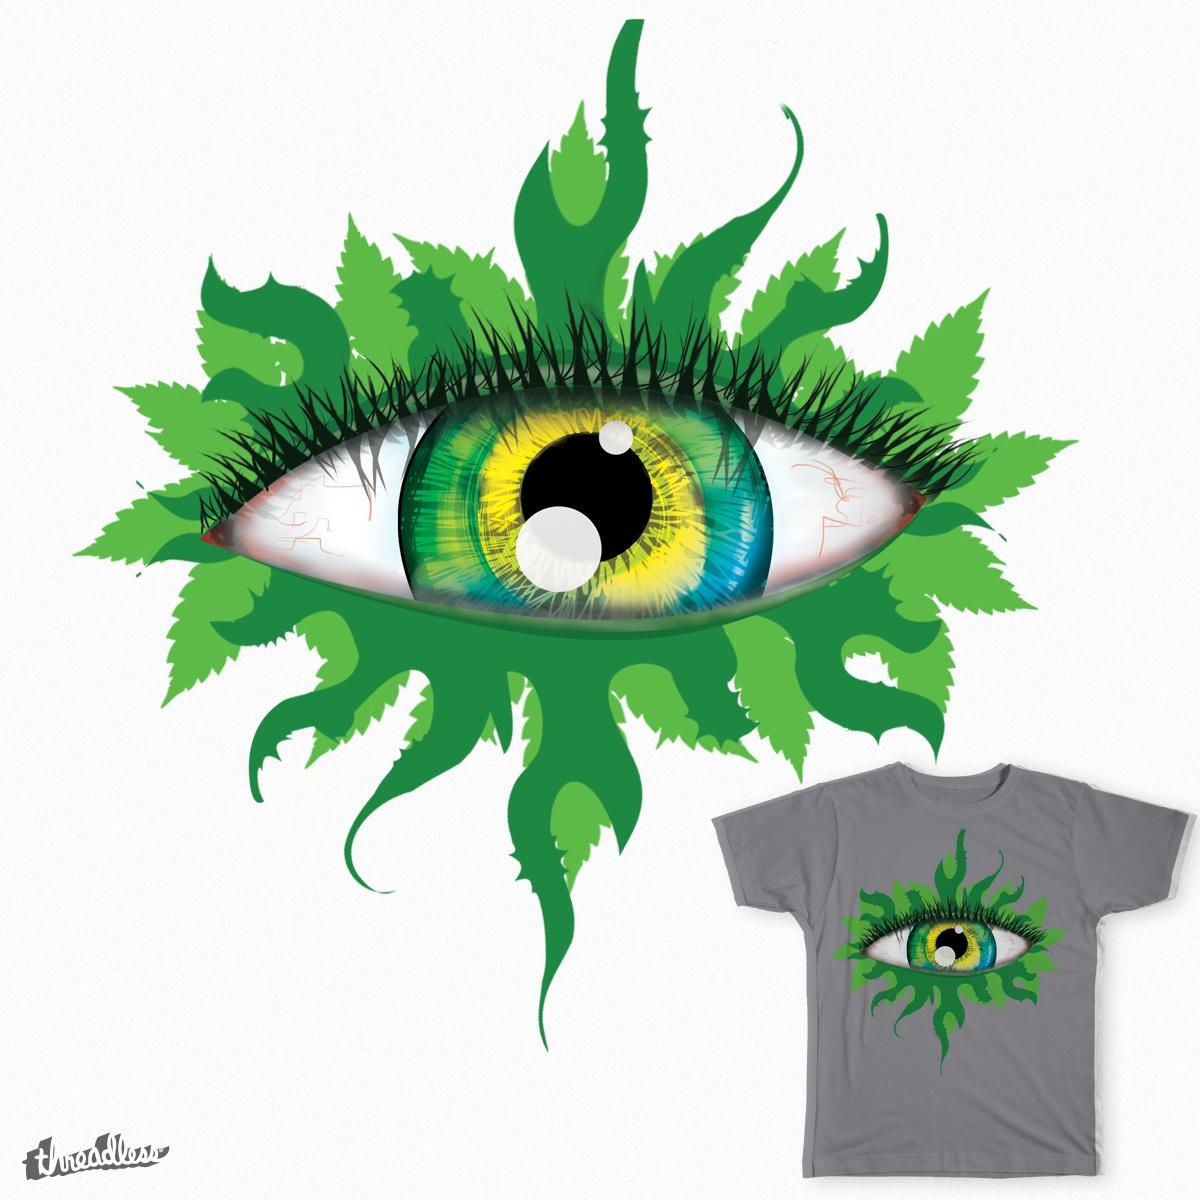 Flower Eye by CrystalStar on Threadless